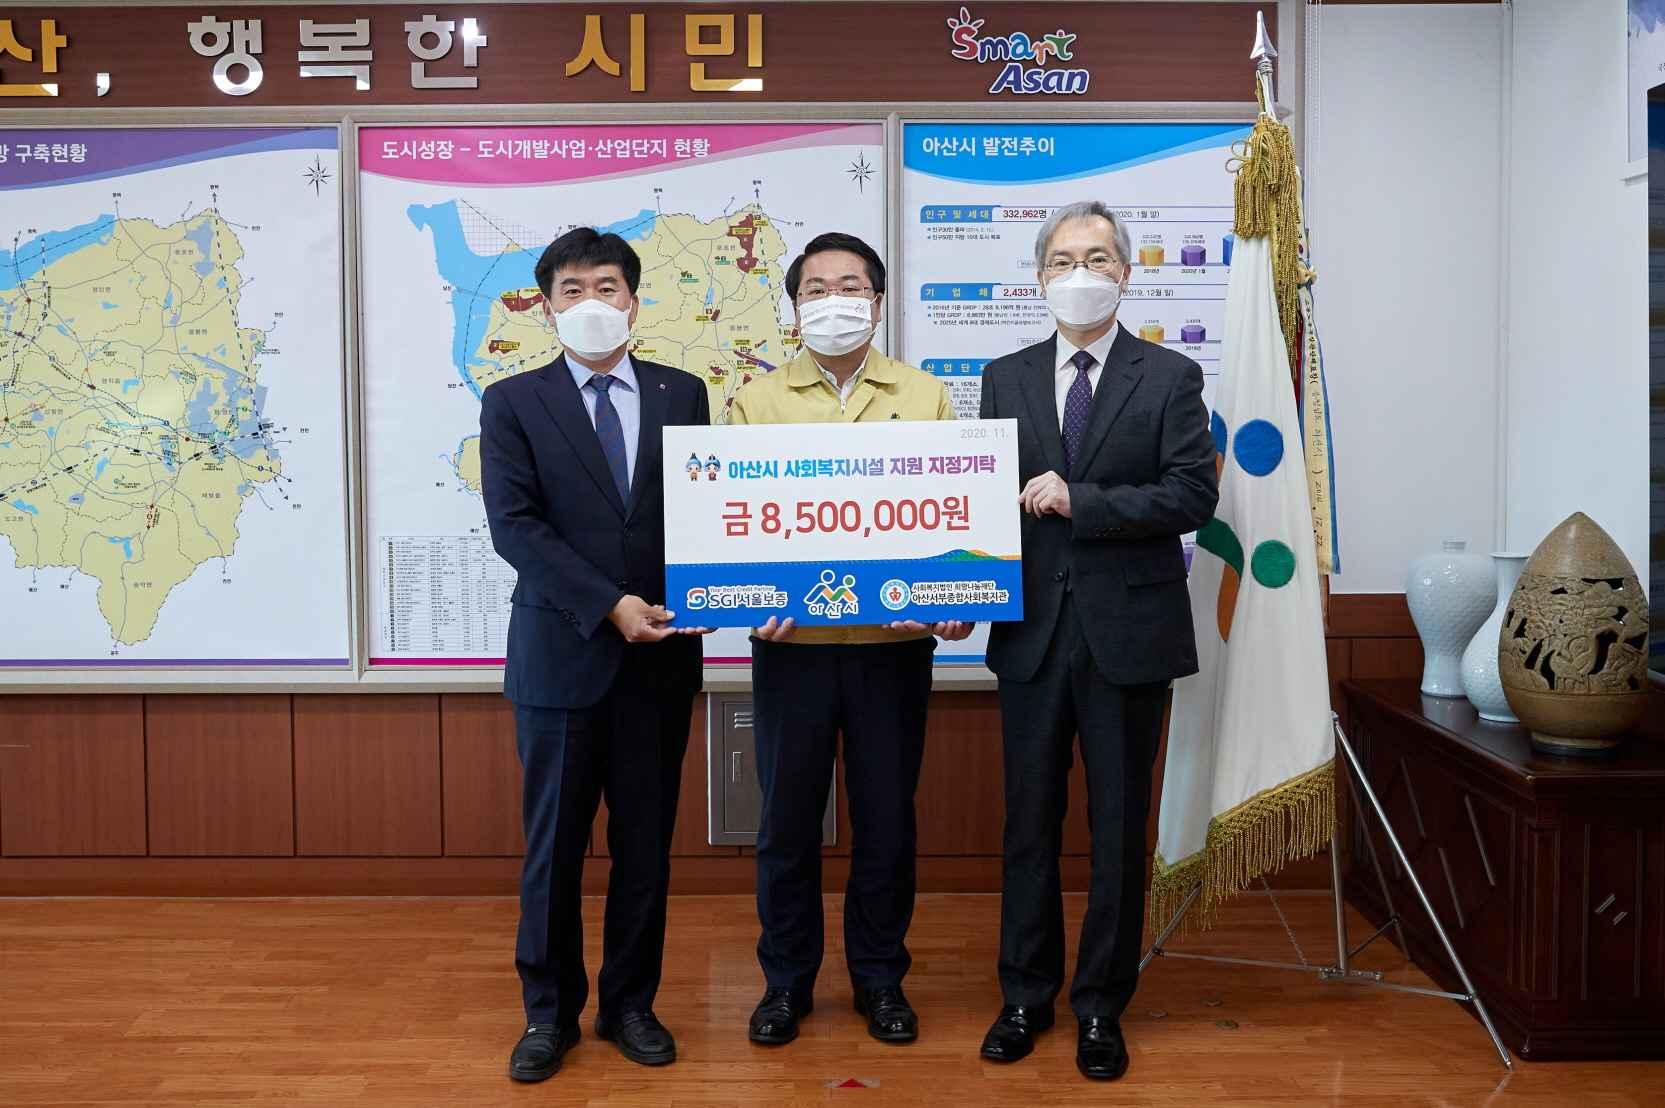 SGI서울보증 중부지역본부, 아산서부종합사회복지관 기능보강 후원금 850만원 전달 관련사진